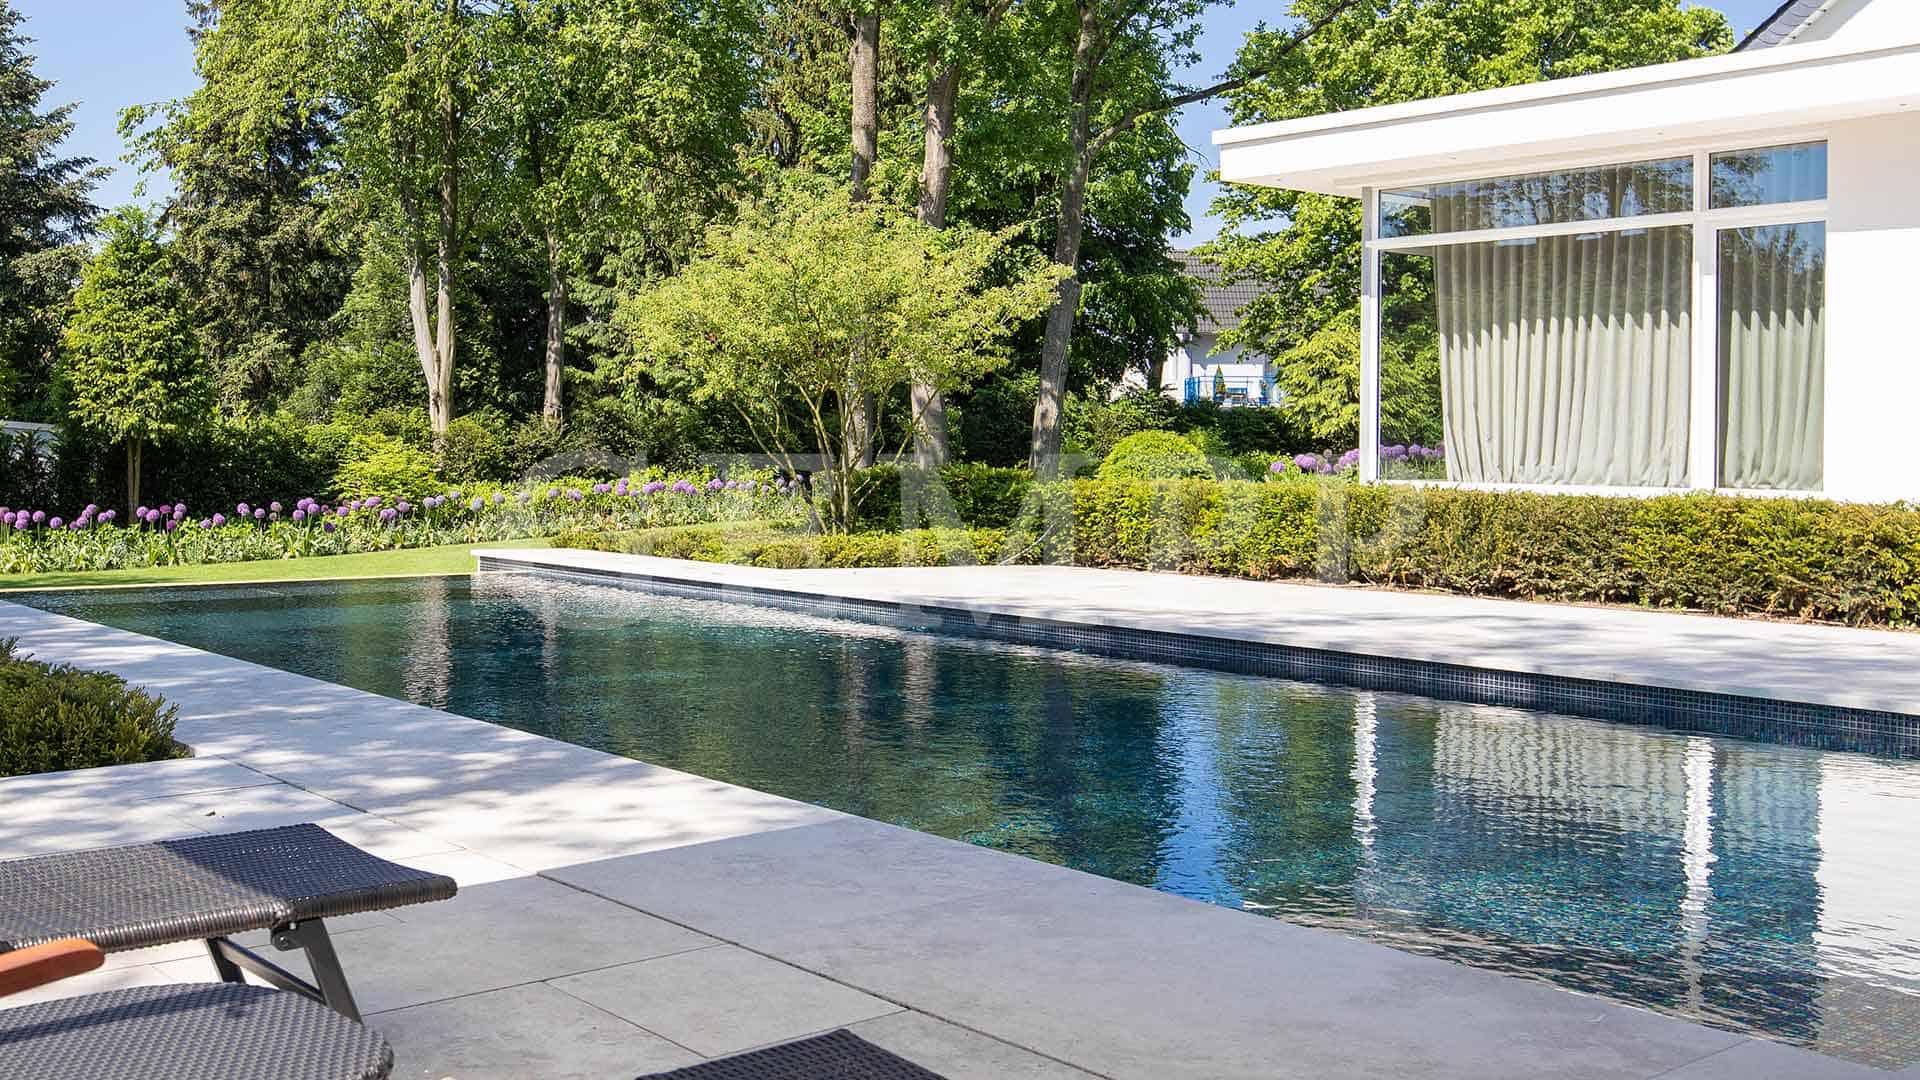 Gartenpool Pool im Garten